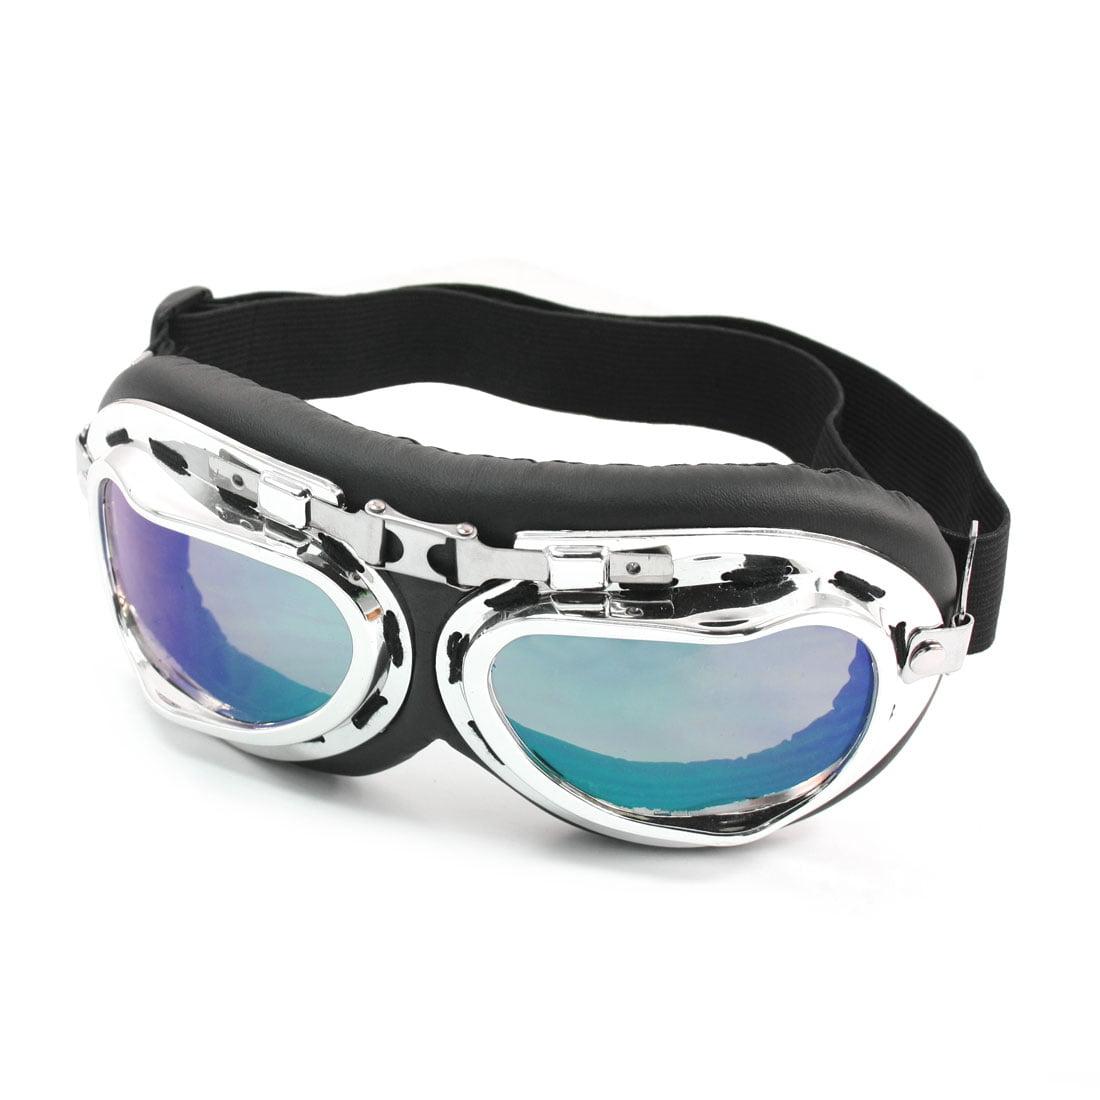 Men Adjustable Elastic Head Strap Motorcycle Tinted Glasses Sunglasses